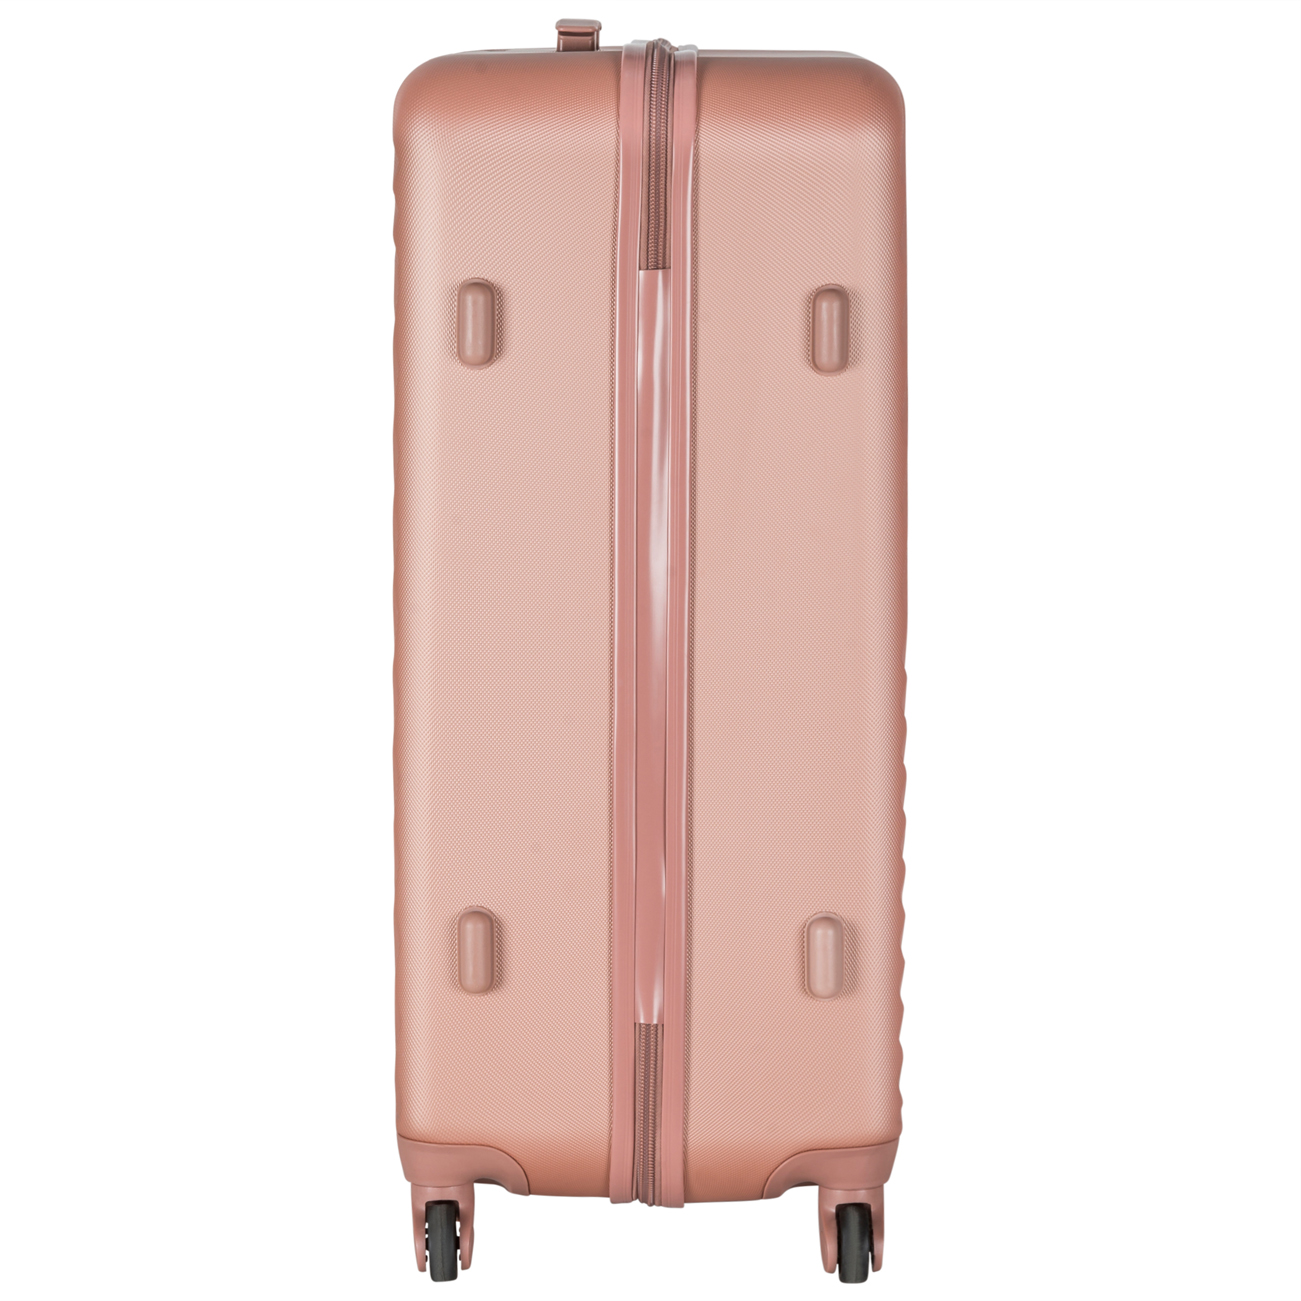 Coque dure Valise cabine fixe Sac Voyage Couleurs Diverses Taille Maximale Lufthansa